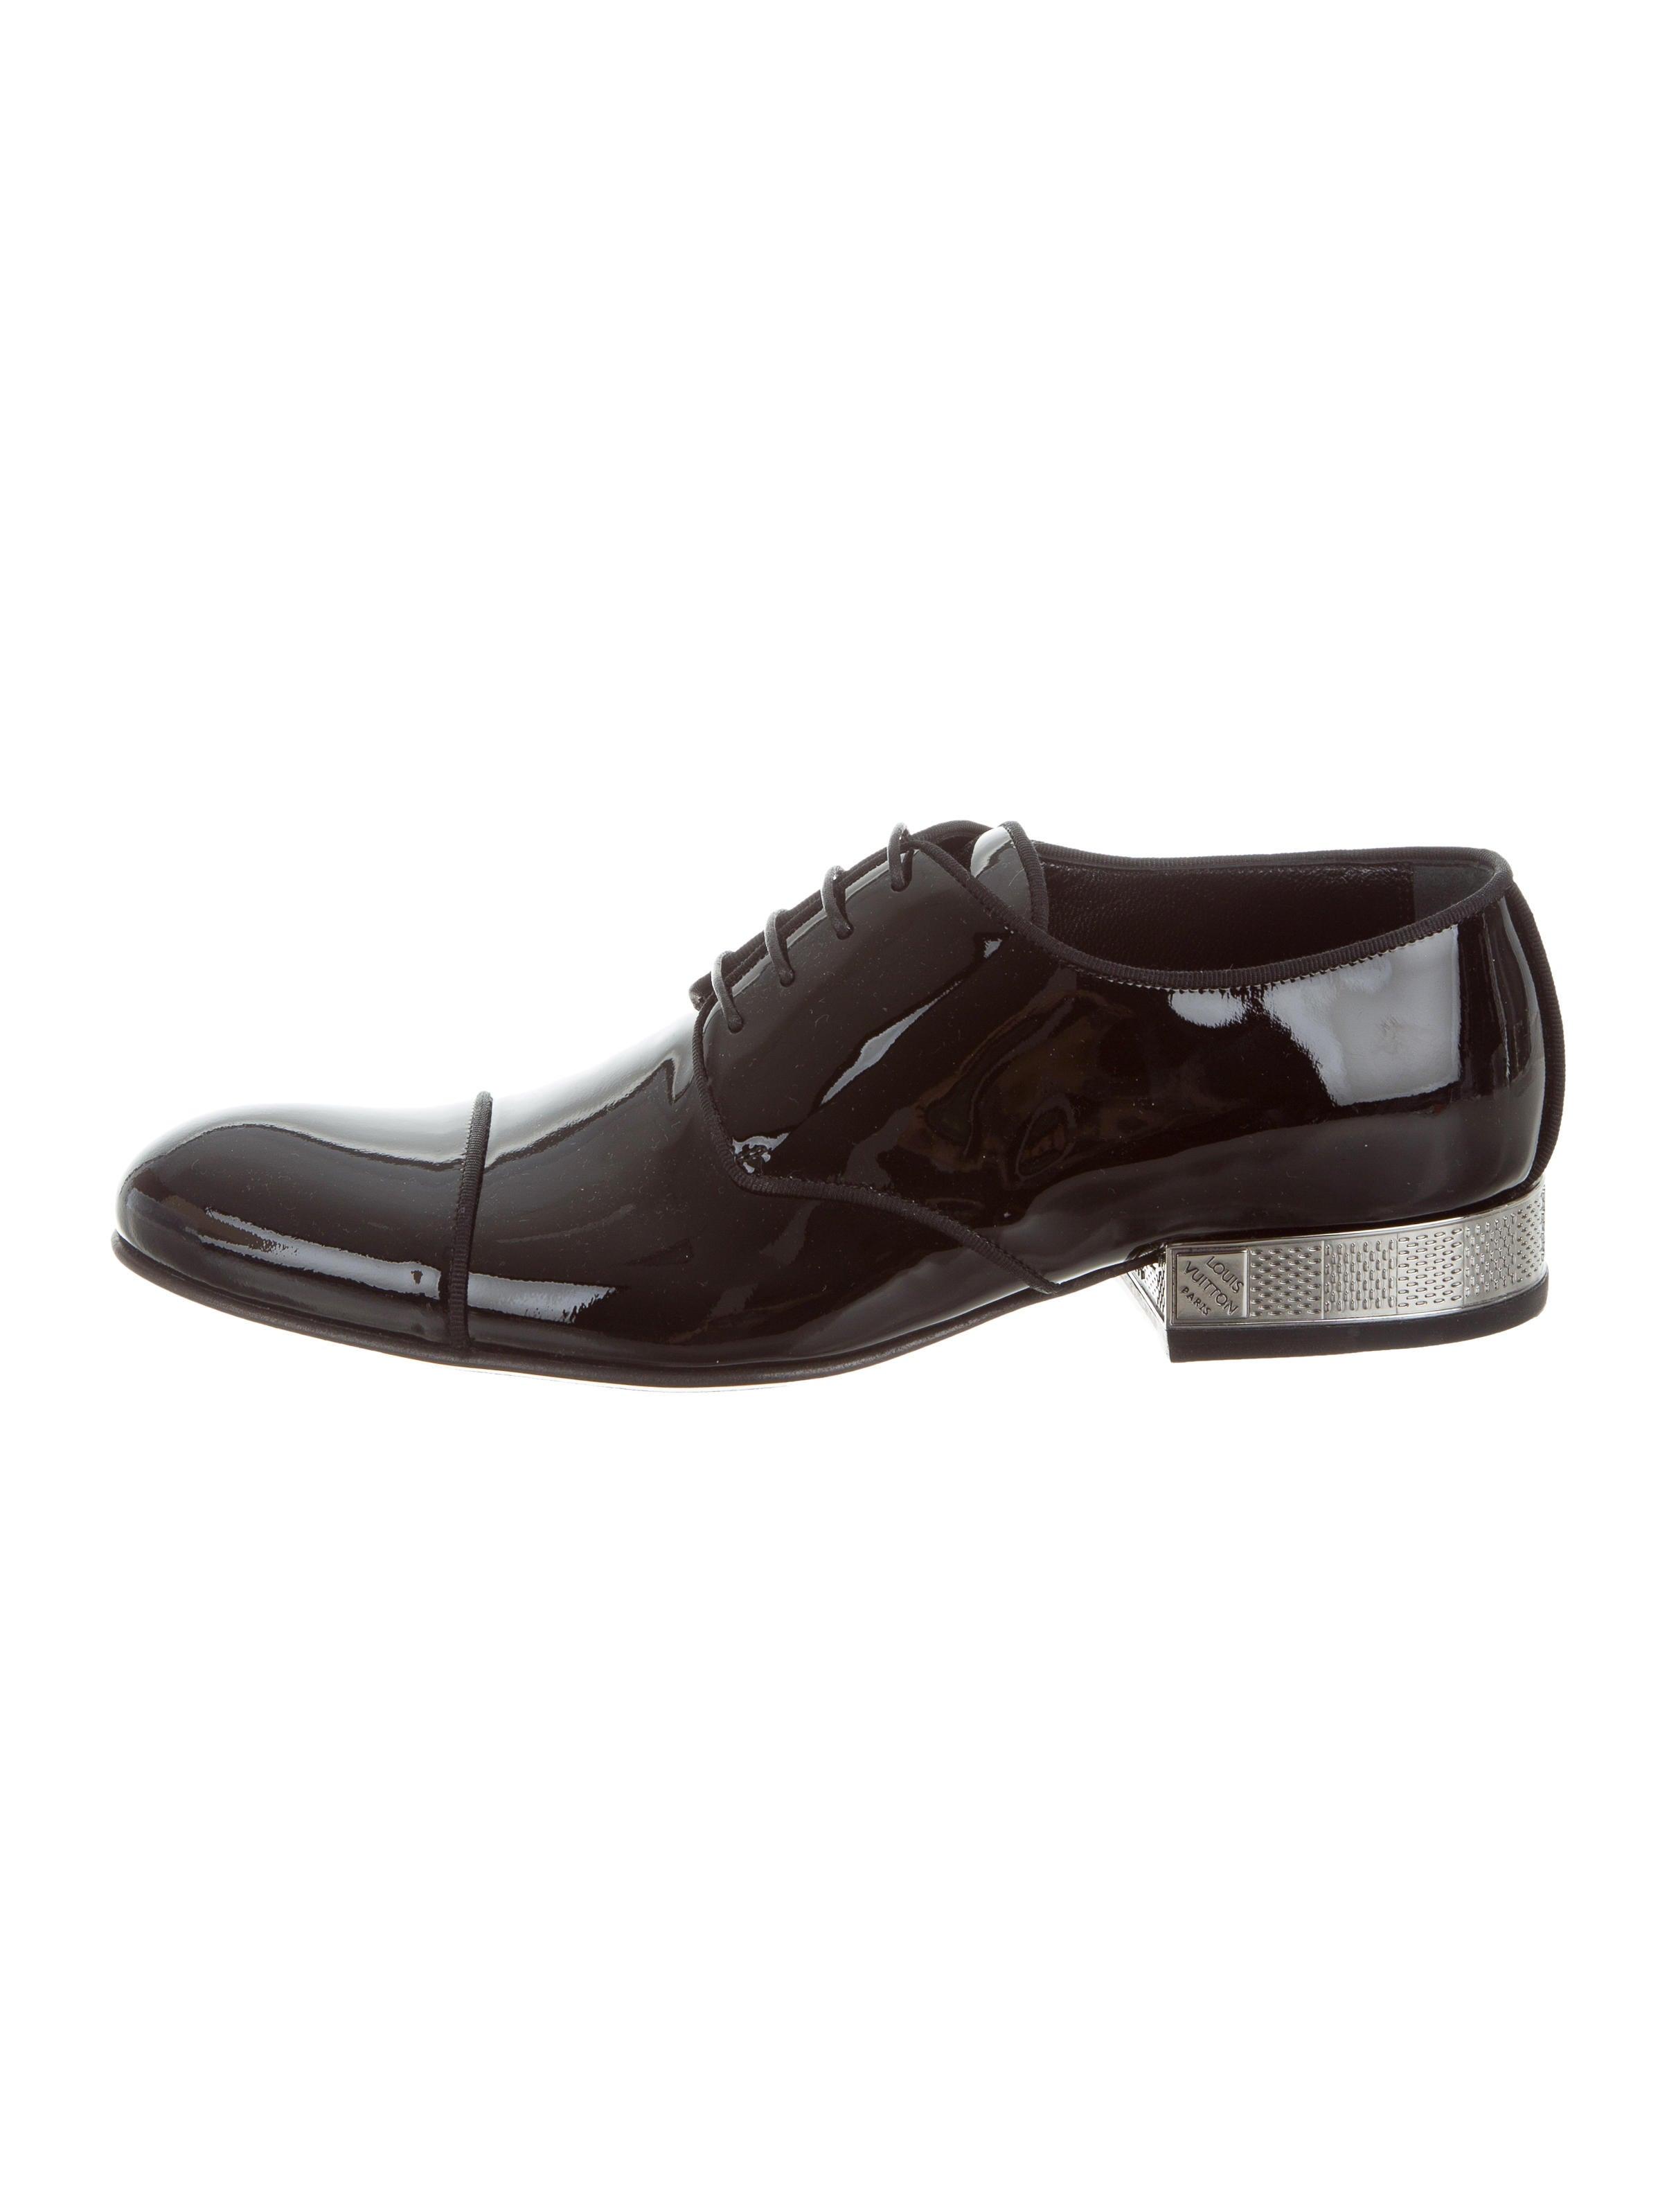 louis vuitton patent leather damier derby shoes w tags